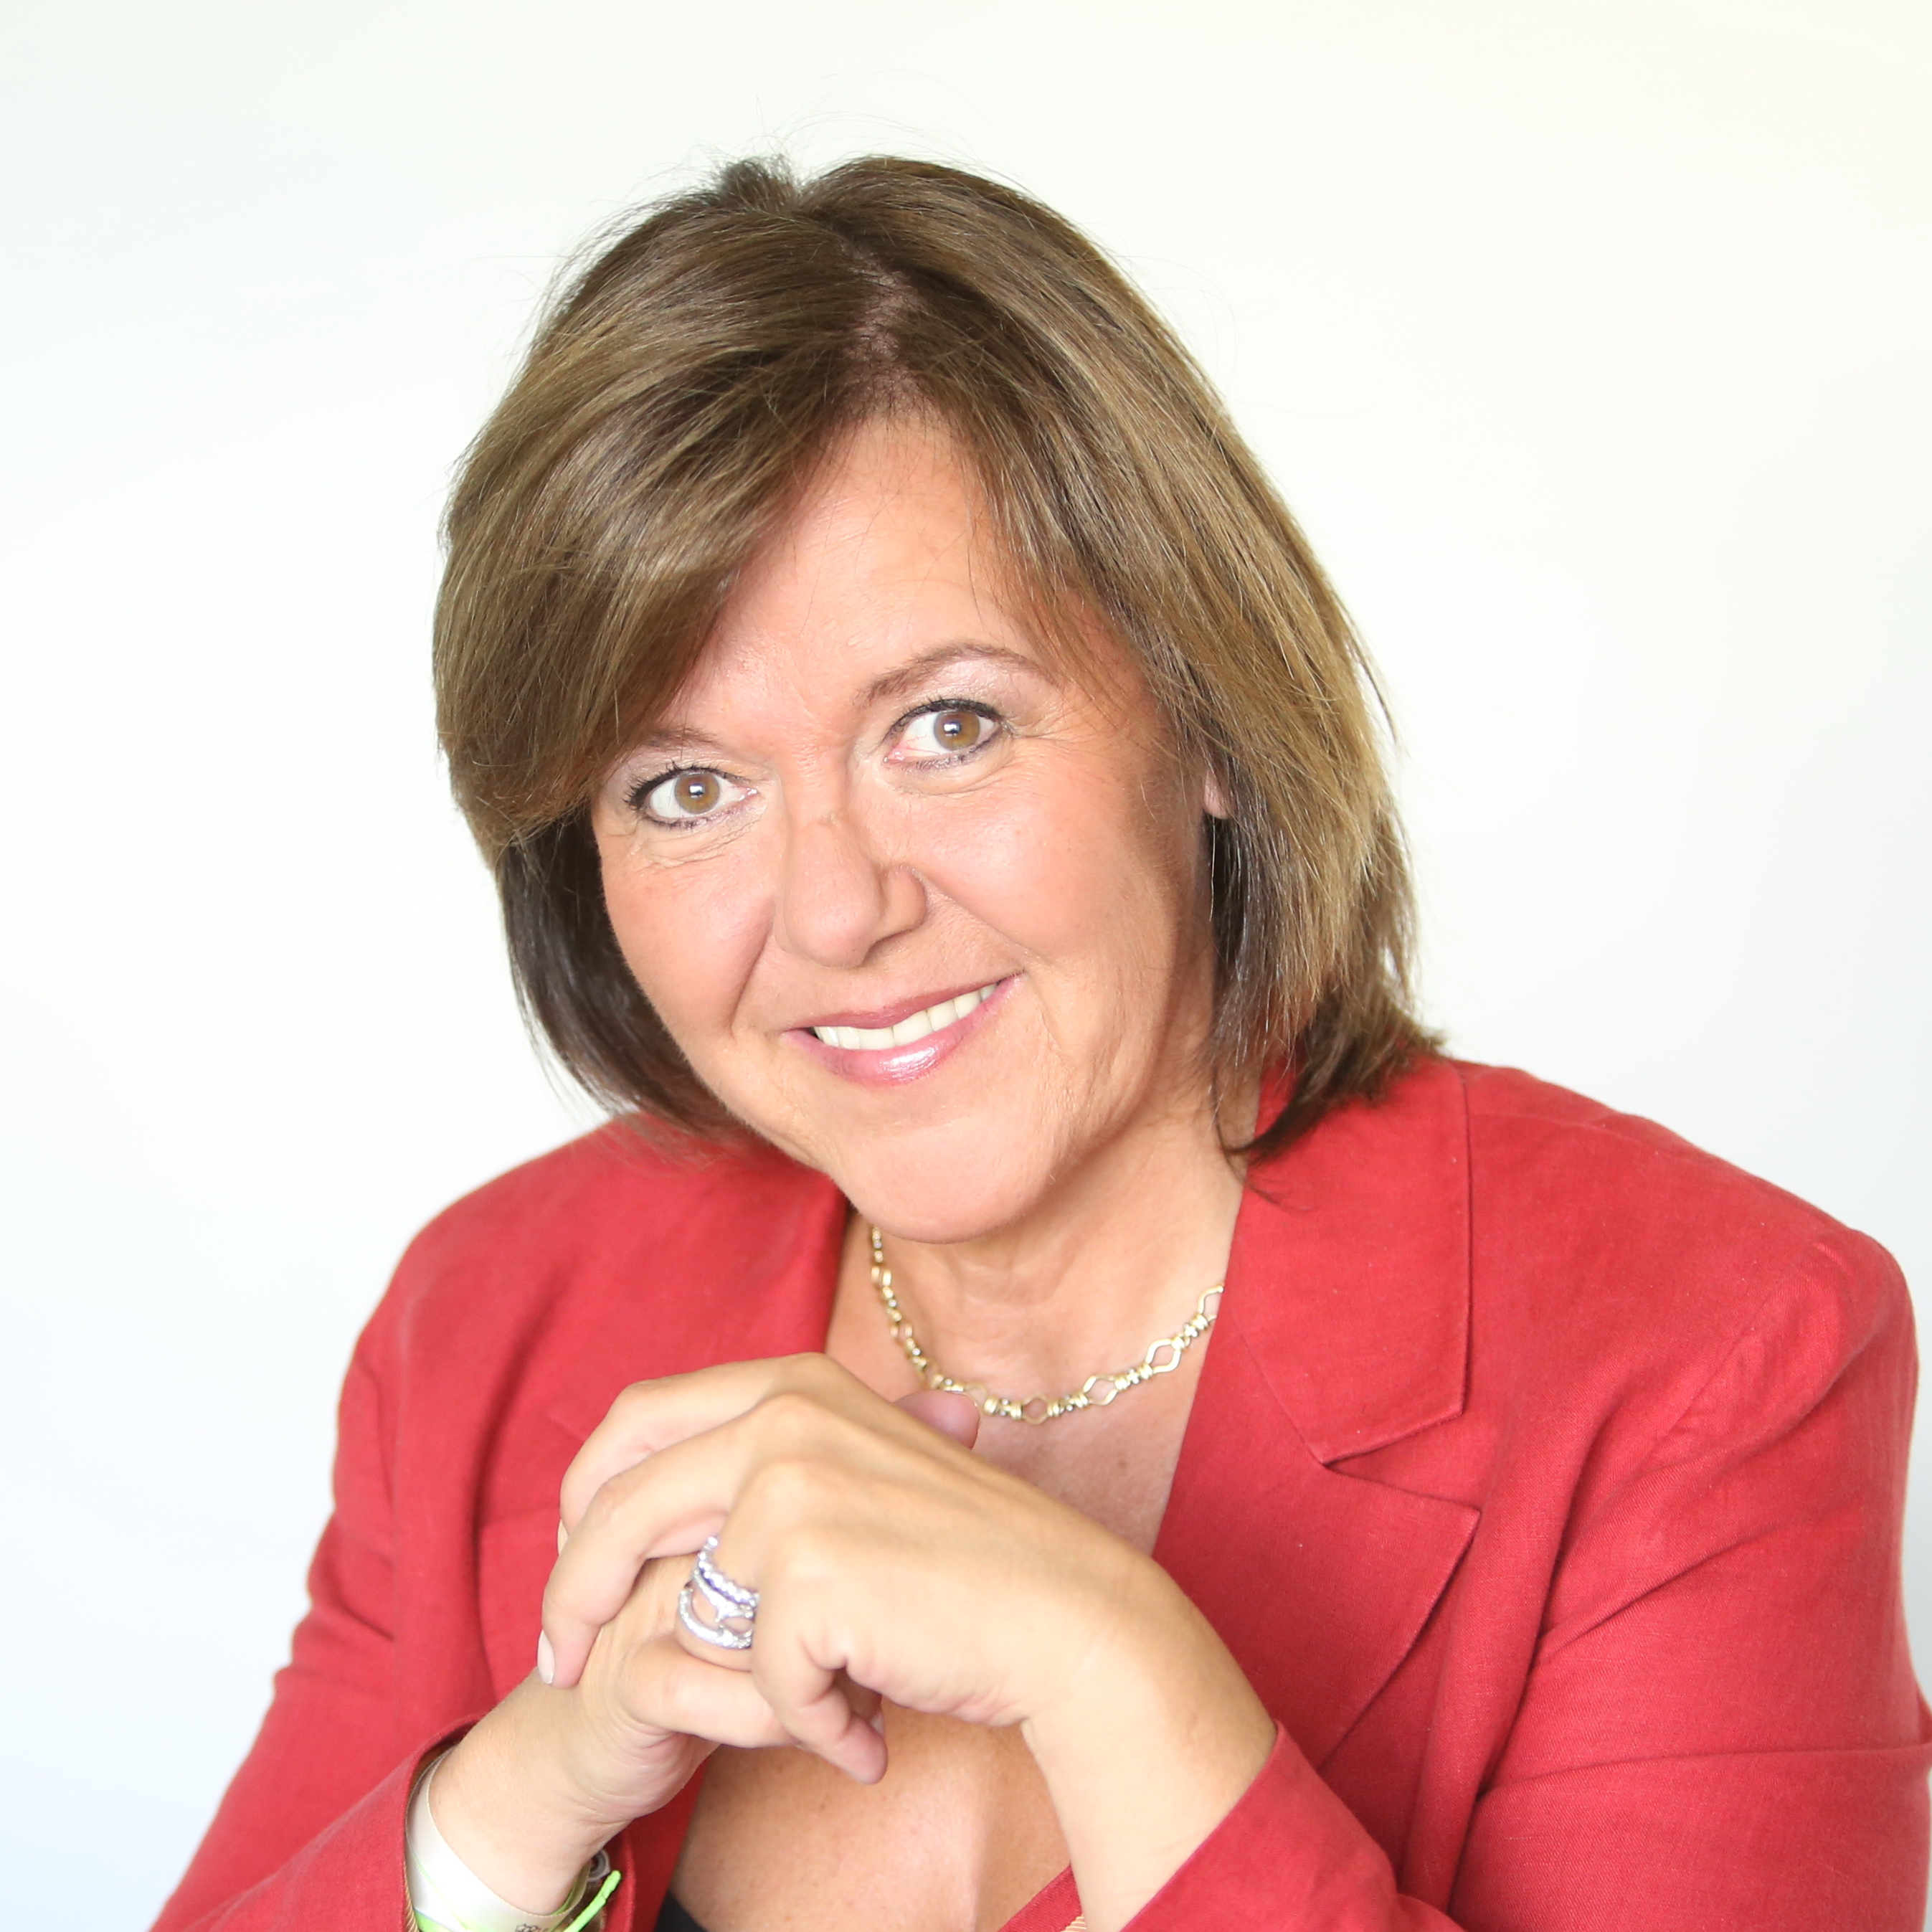 Martine Collet